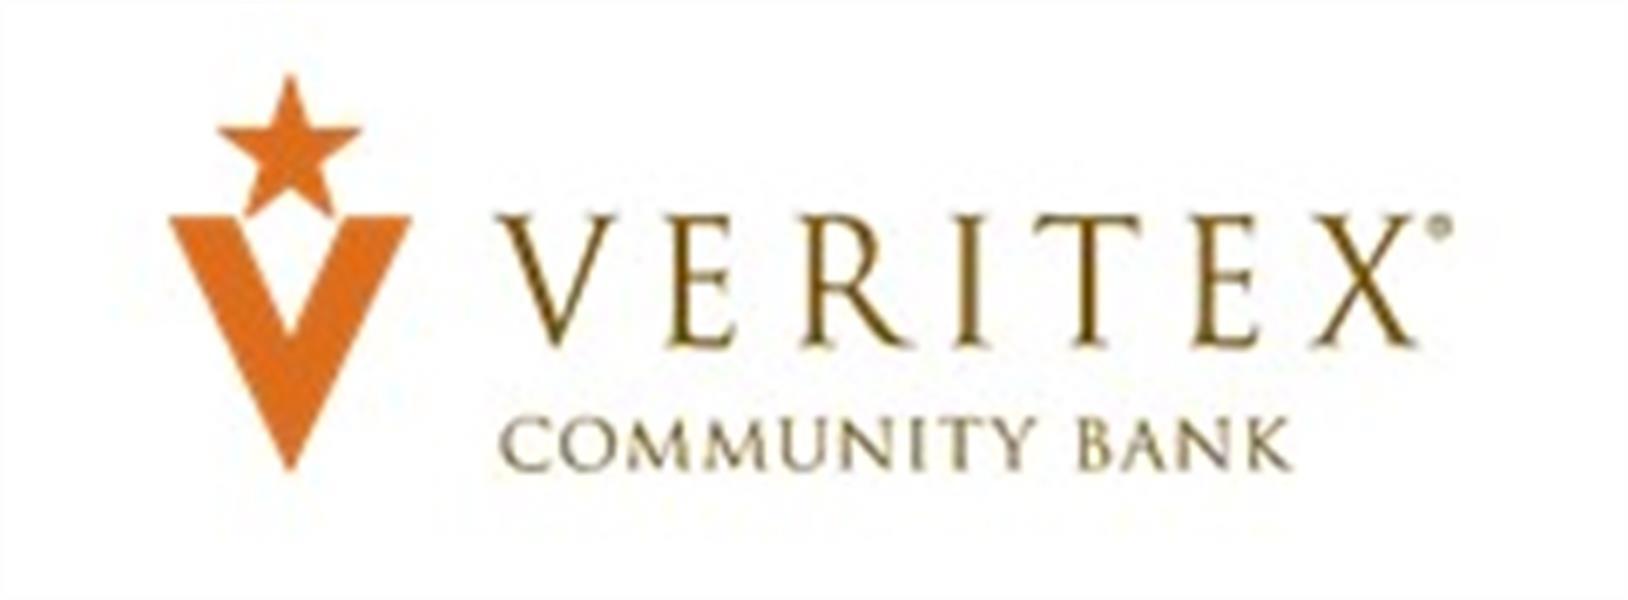 Veritex Community Bank Kingwood